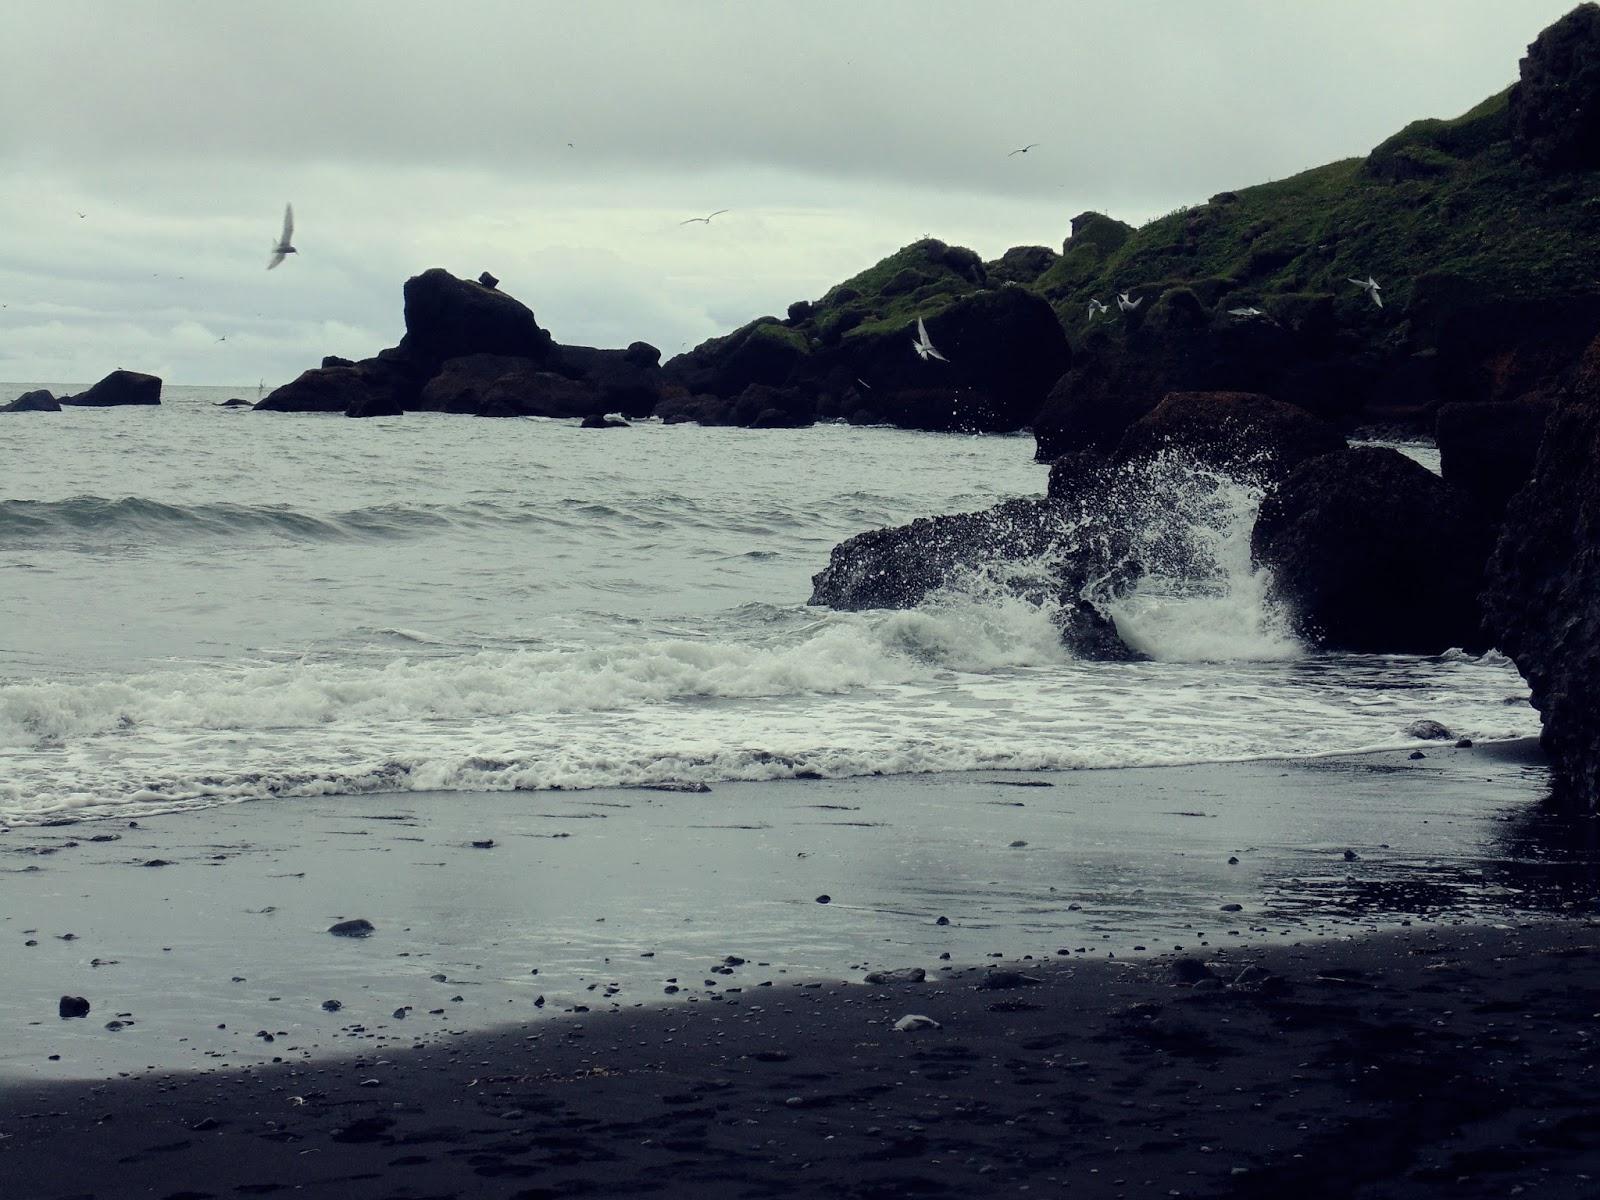 plaża w Viku, Vikurfjara, Vik, miasteczko Vik, islandzkie miasto, Islandia, południowa Islandia, brzydka Islandia, islandzka plaża